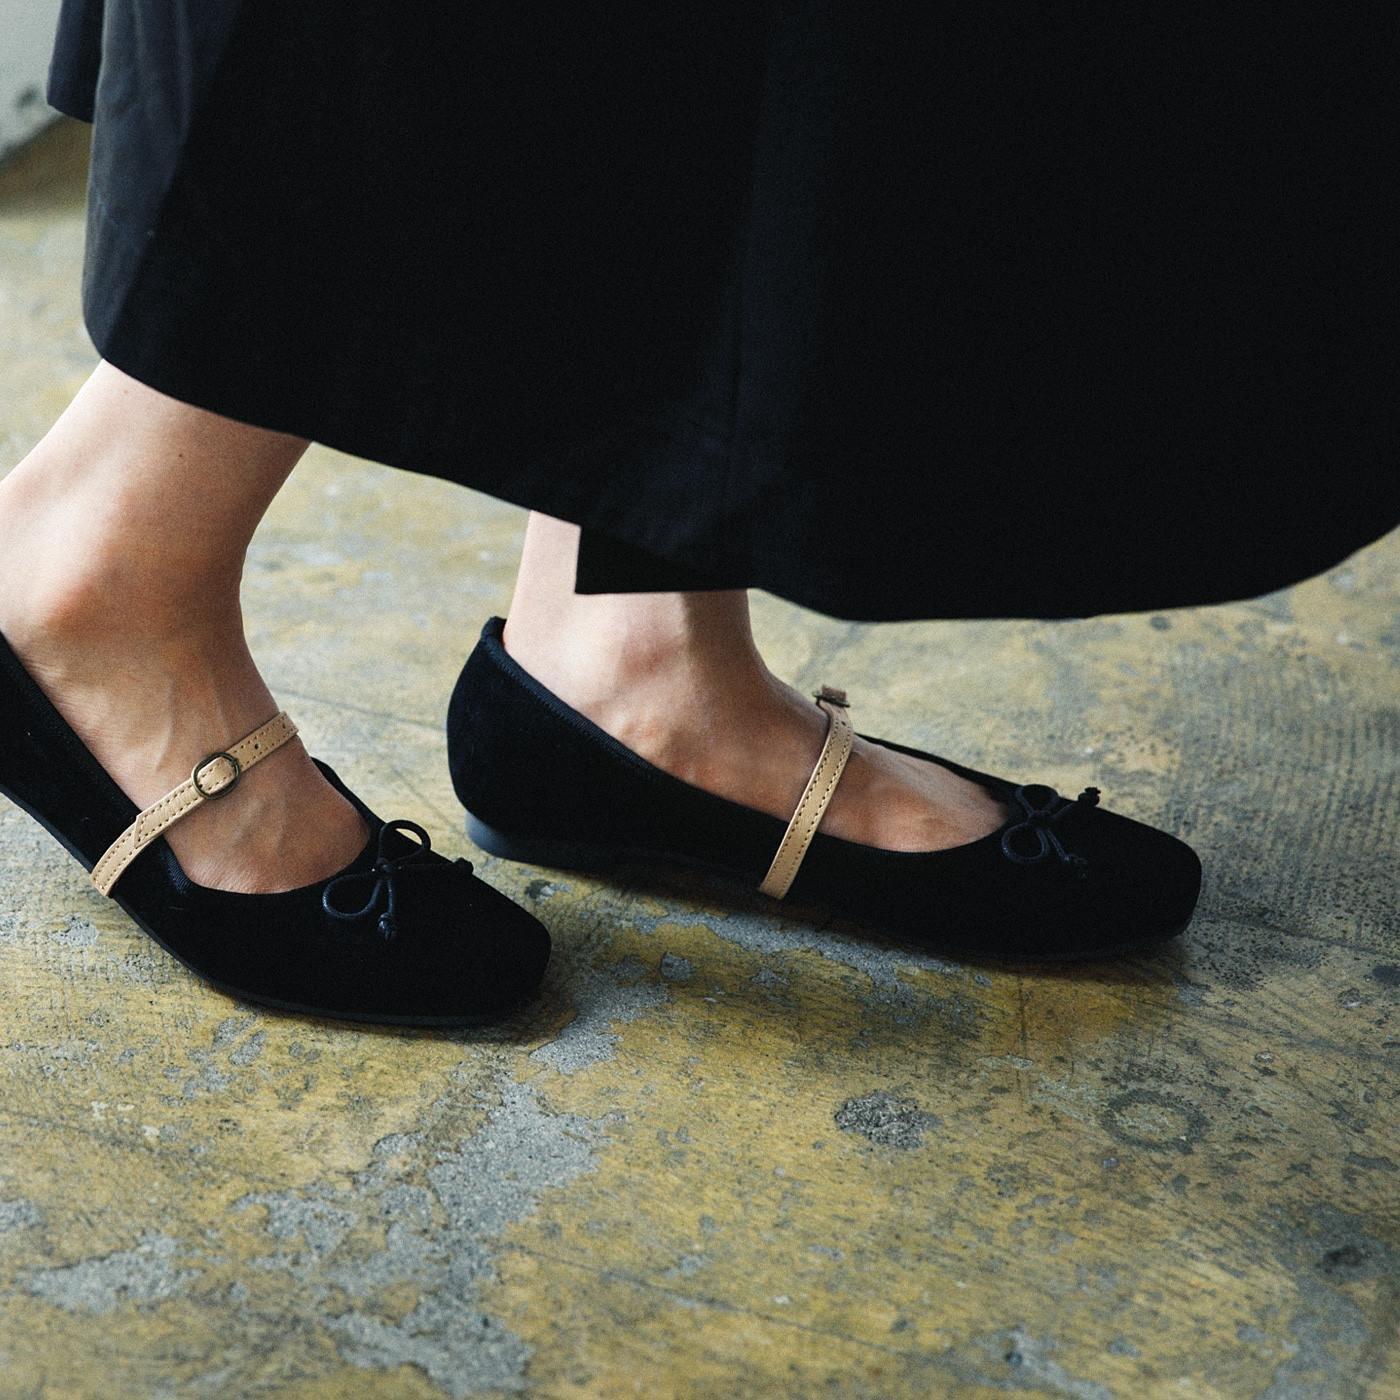 el:ment パカパカ脱げを気にしない 靴が足にフィットする本格的な本革のシューズバンドの会